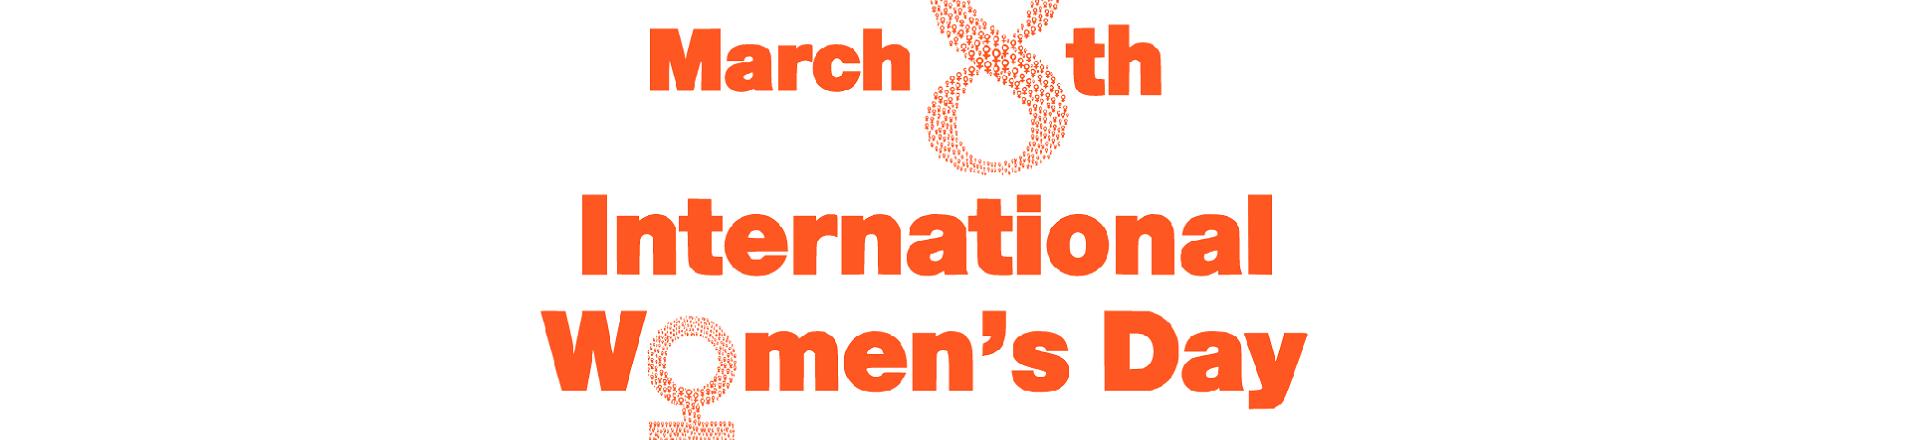 TfL celebrates International Women's Day